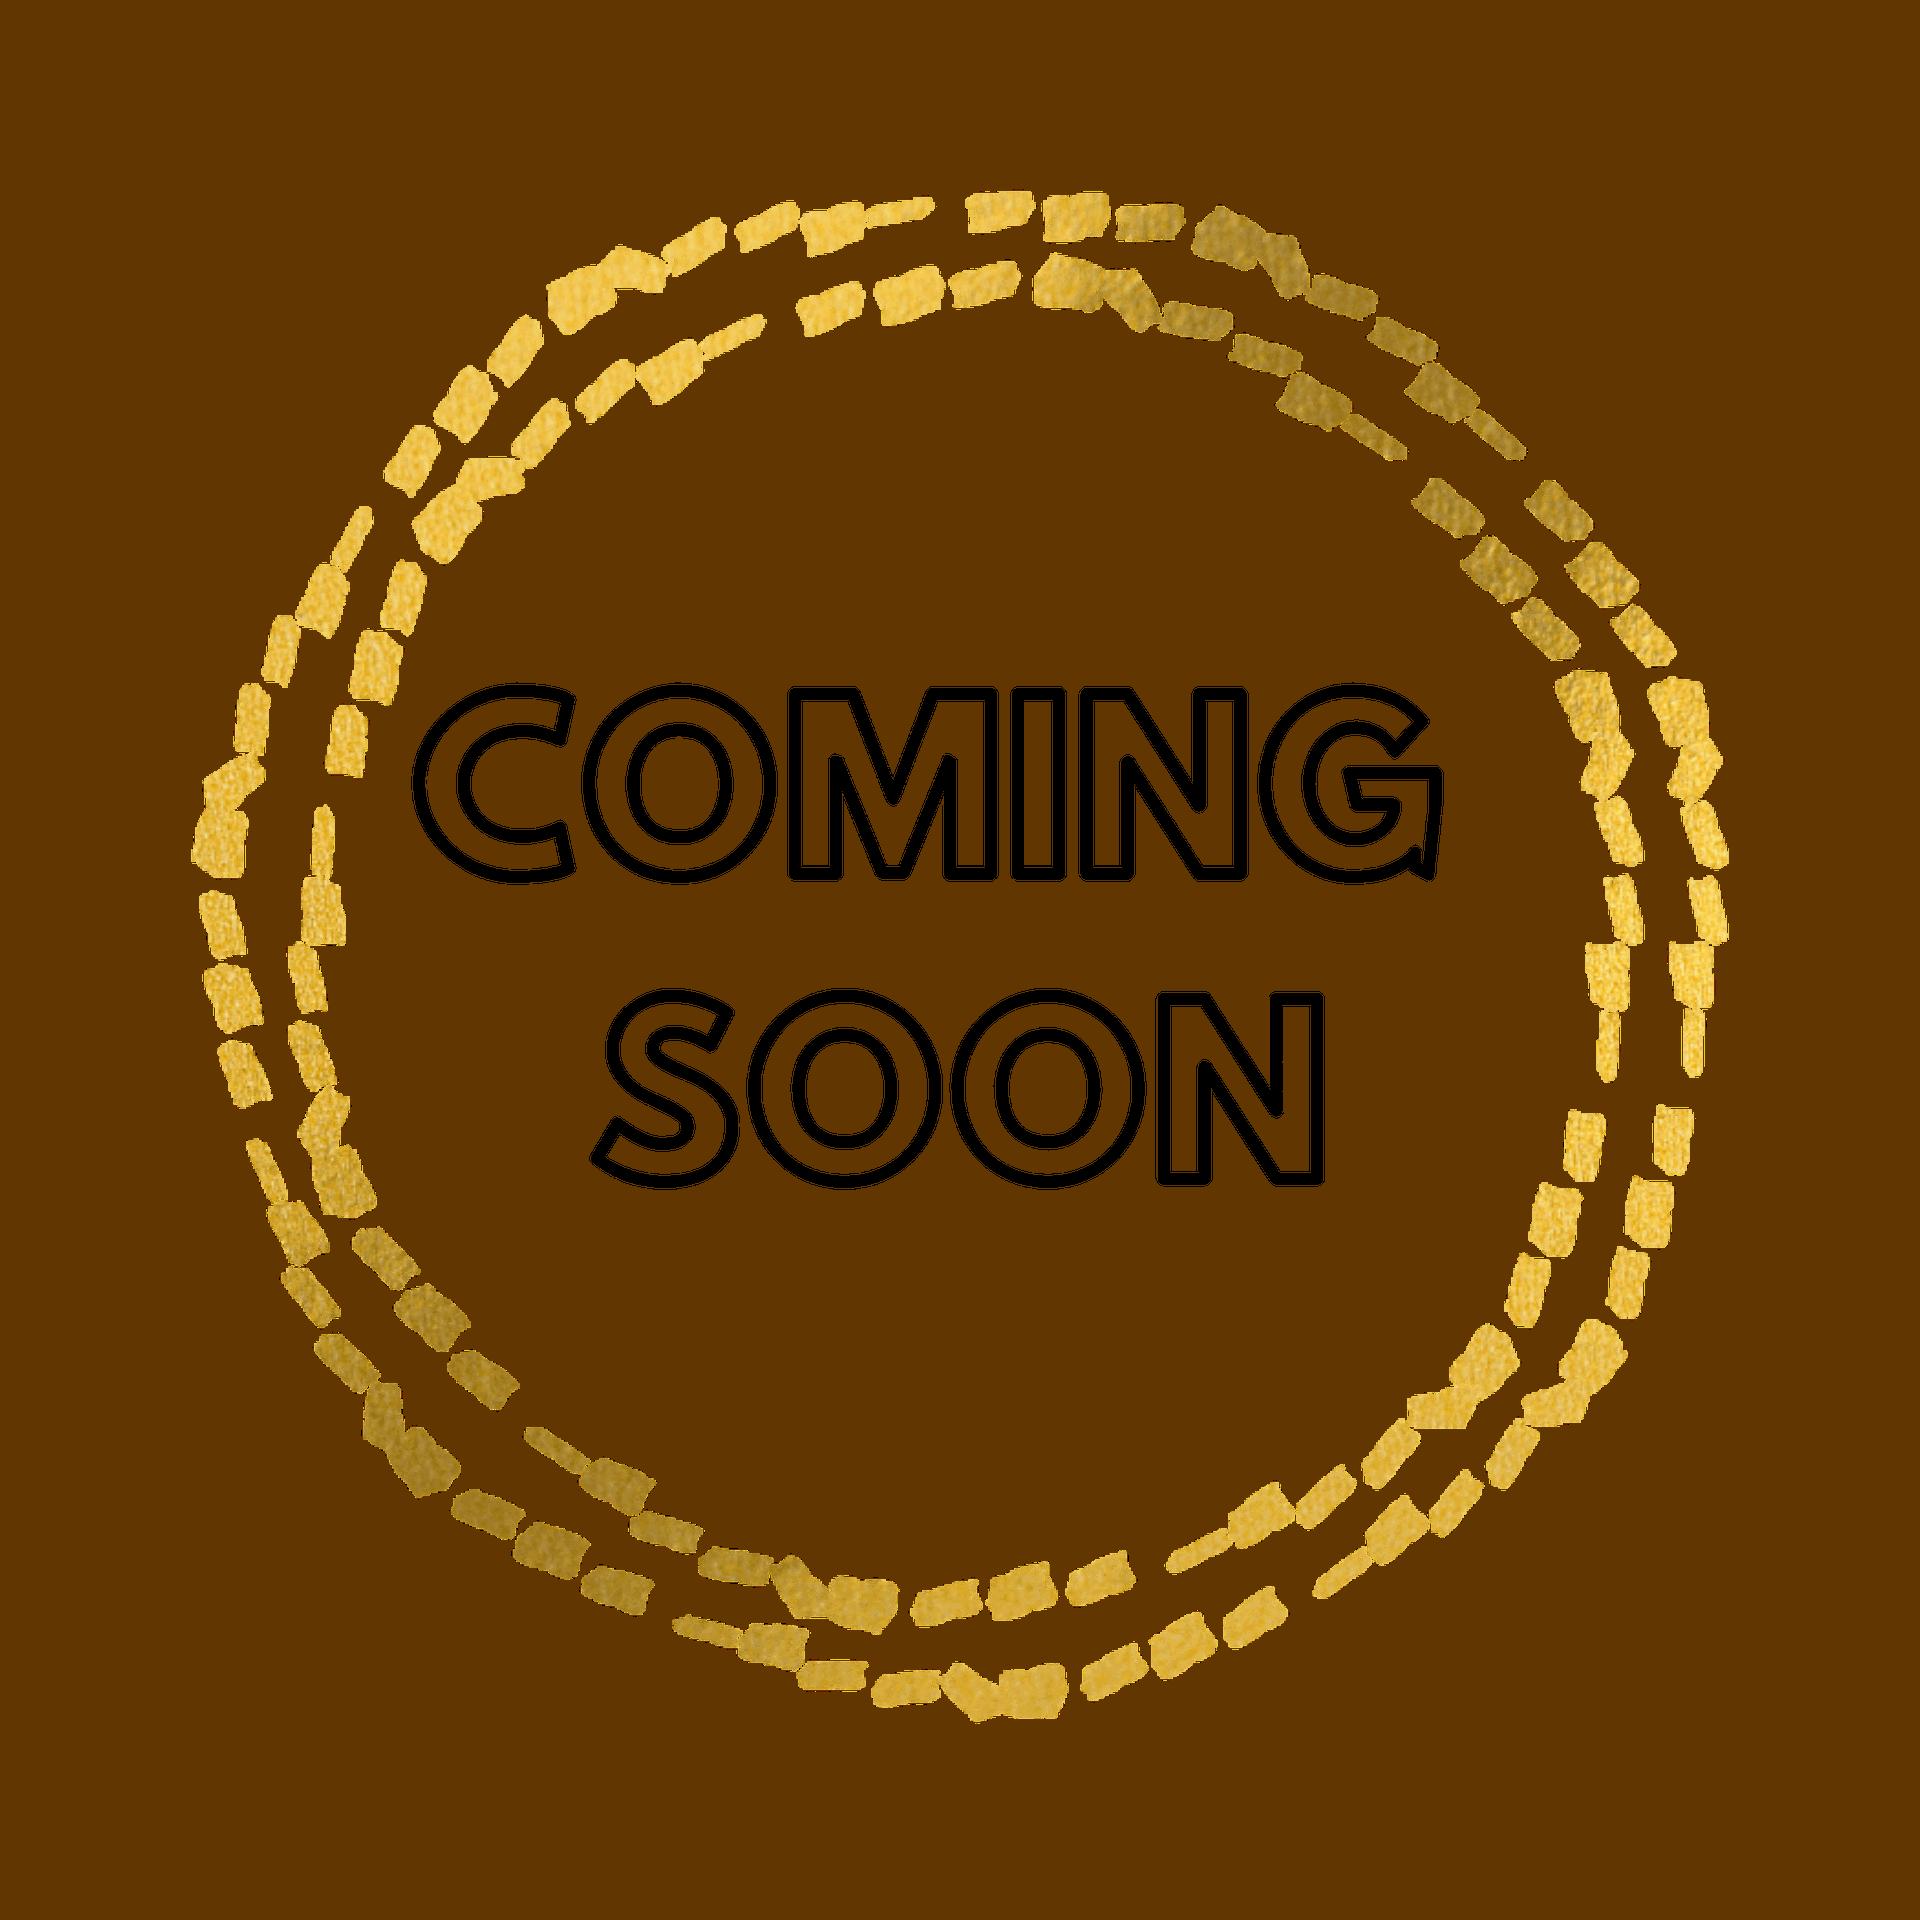 coming-soon-5380230_1920